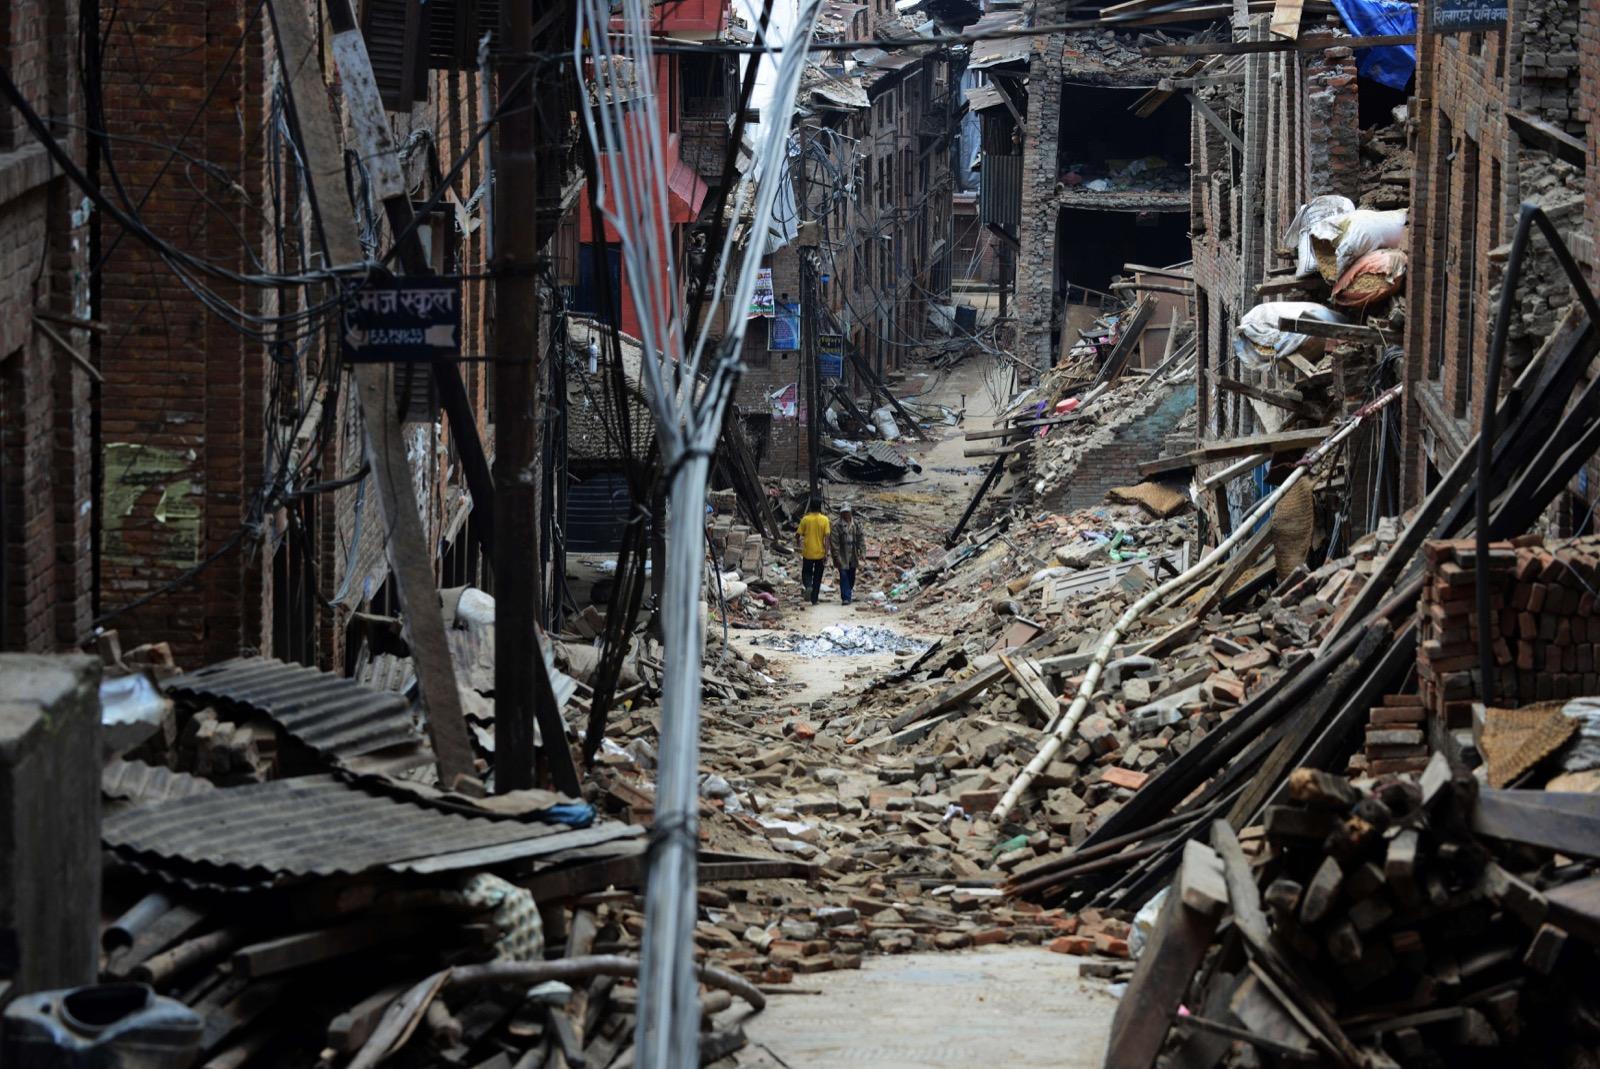 Damaged houses following an earthquake in Bhaktapur on the outskirts of Kathmandu, May 13. PRAKASH MATHEMA/AFP/Getty Images